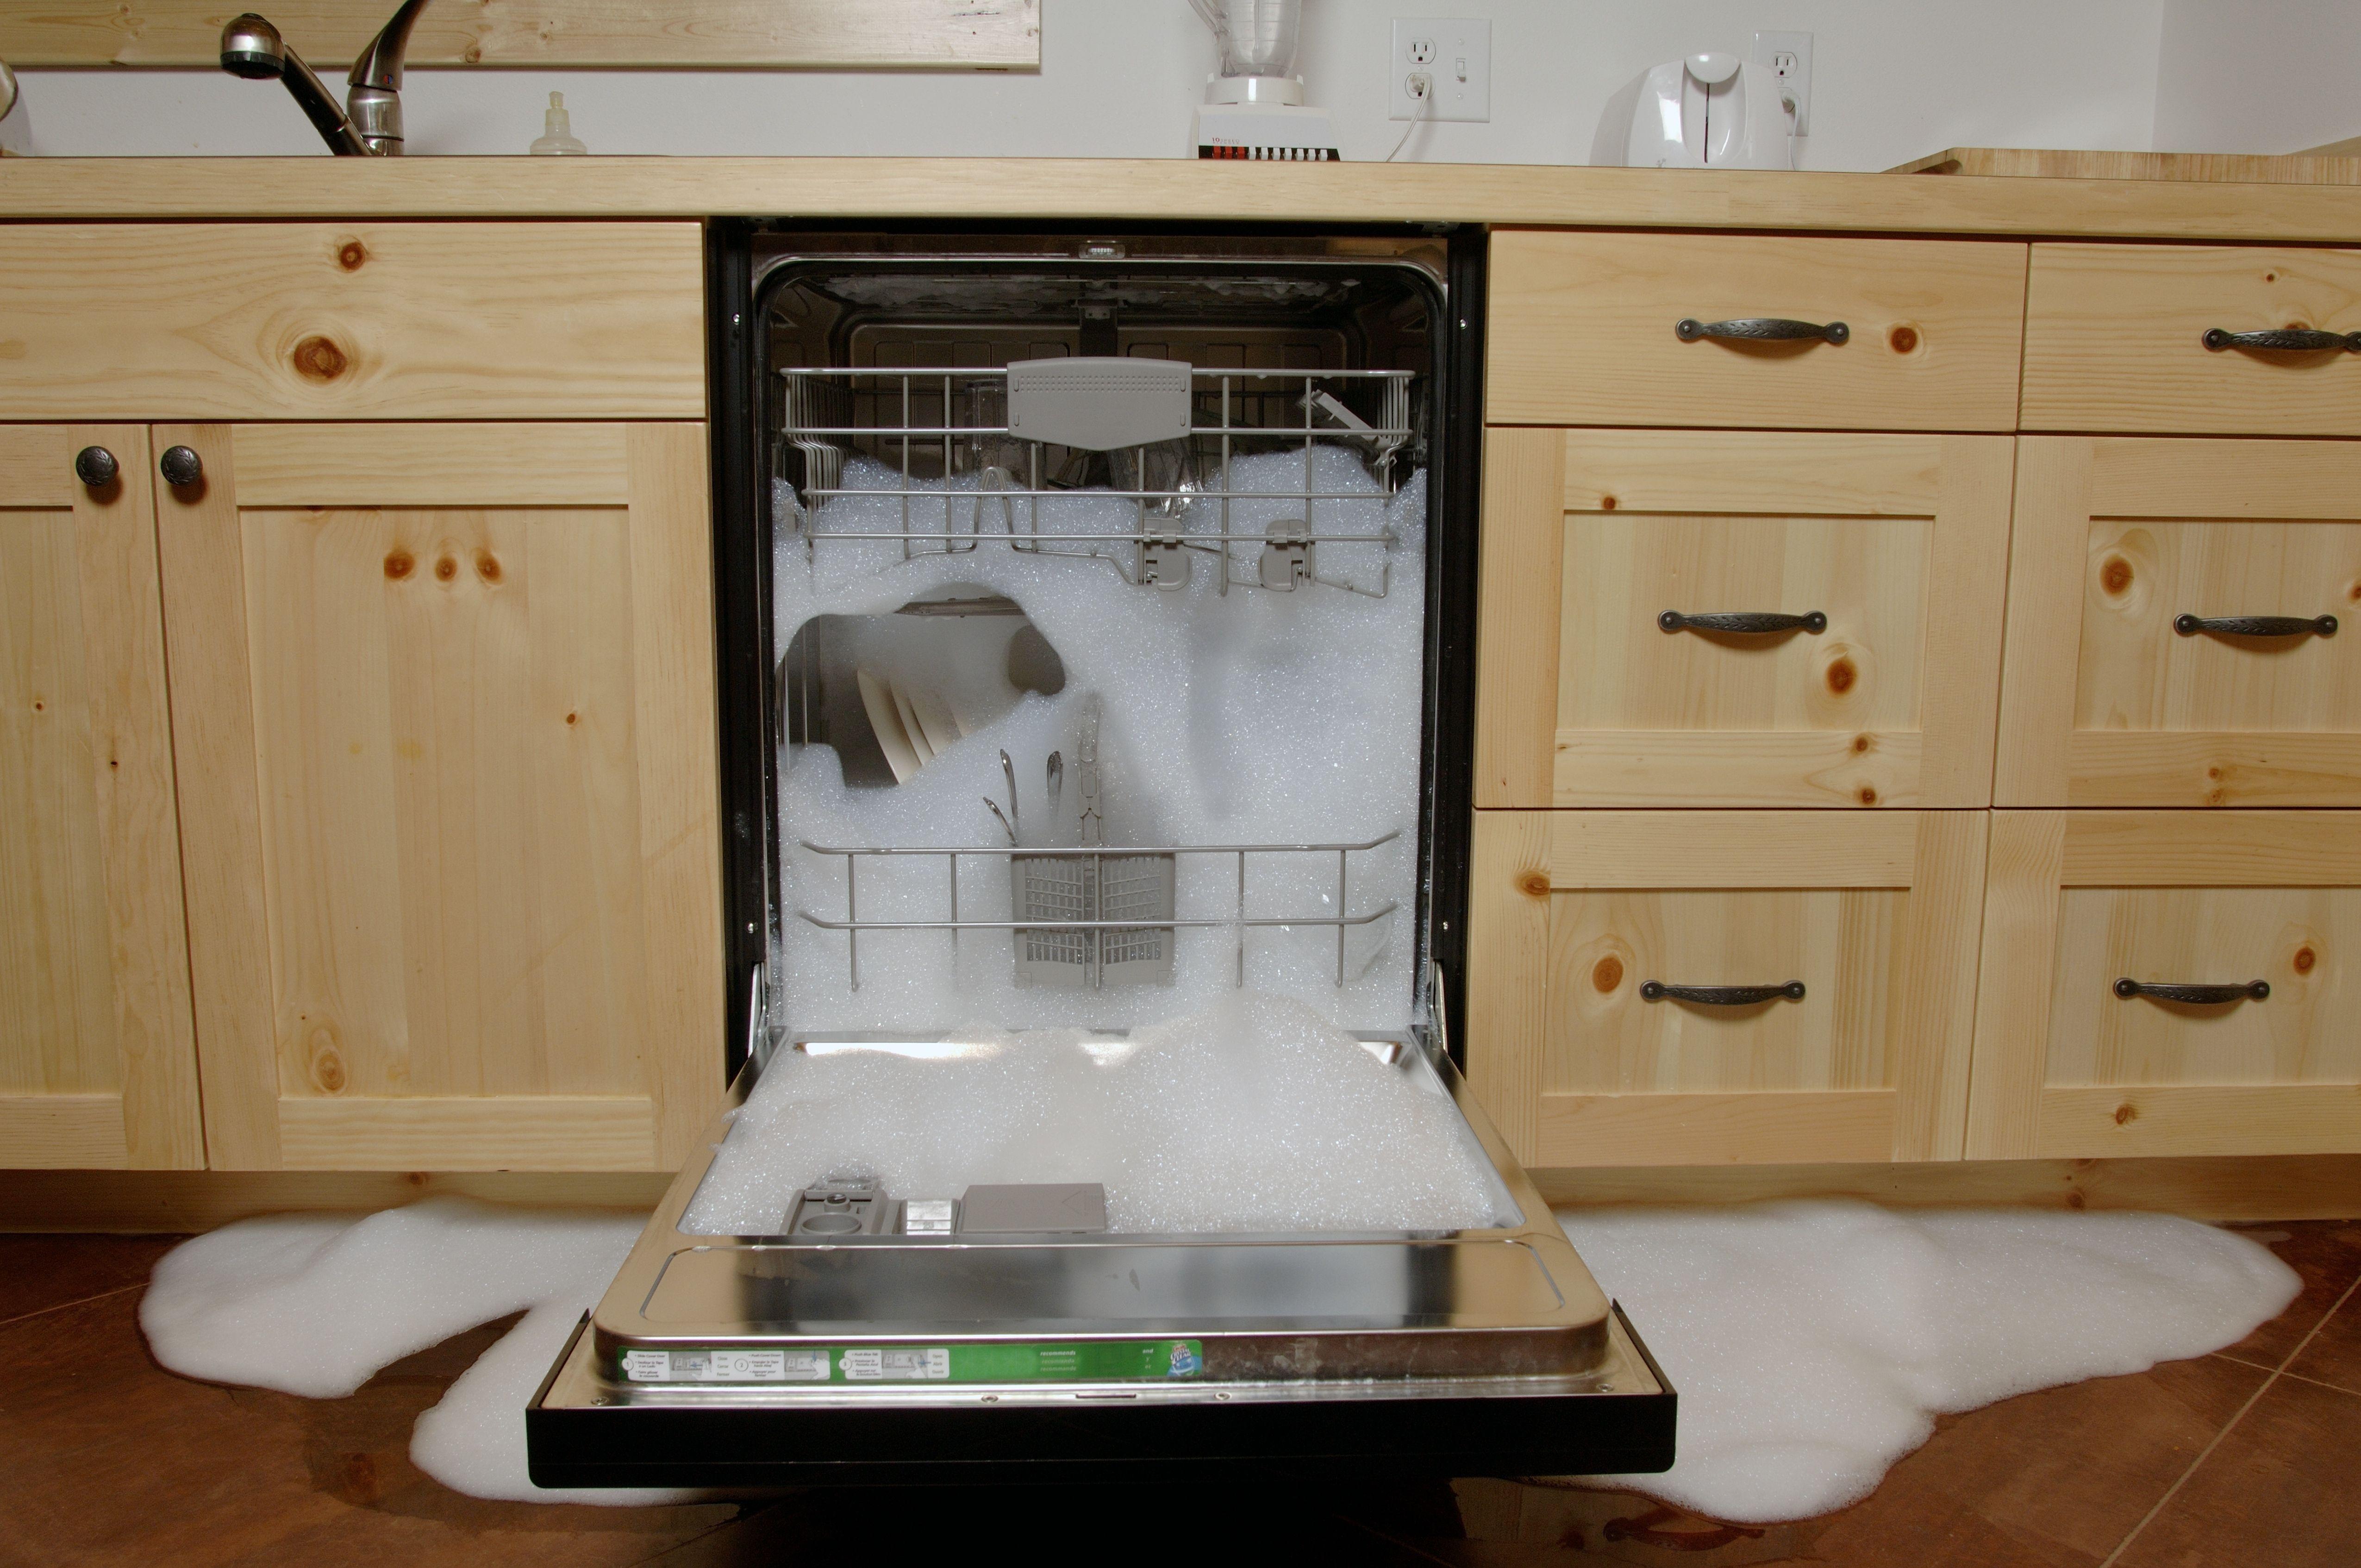 drawer front samsung steel bin door french refrigerator dishwasher single stainless ajmadison cgi silver